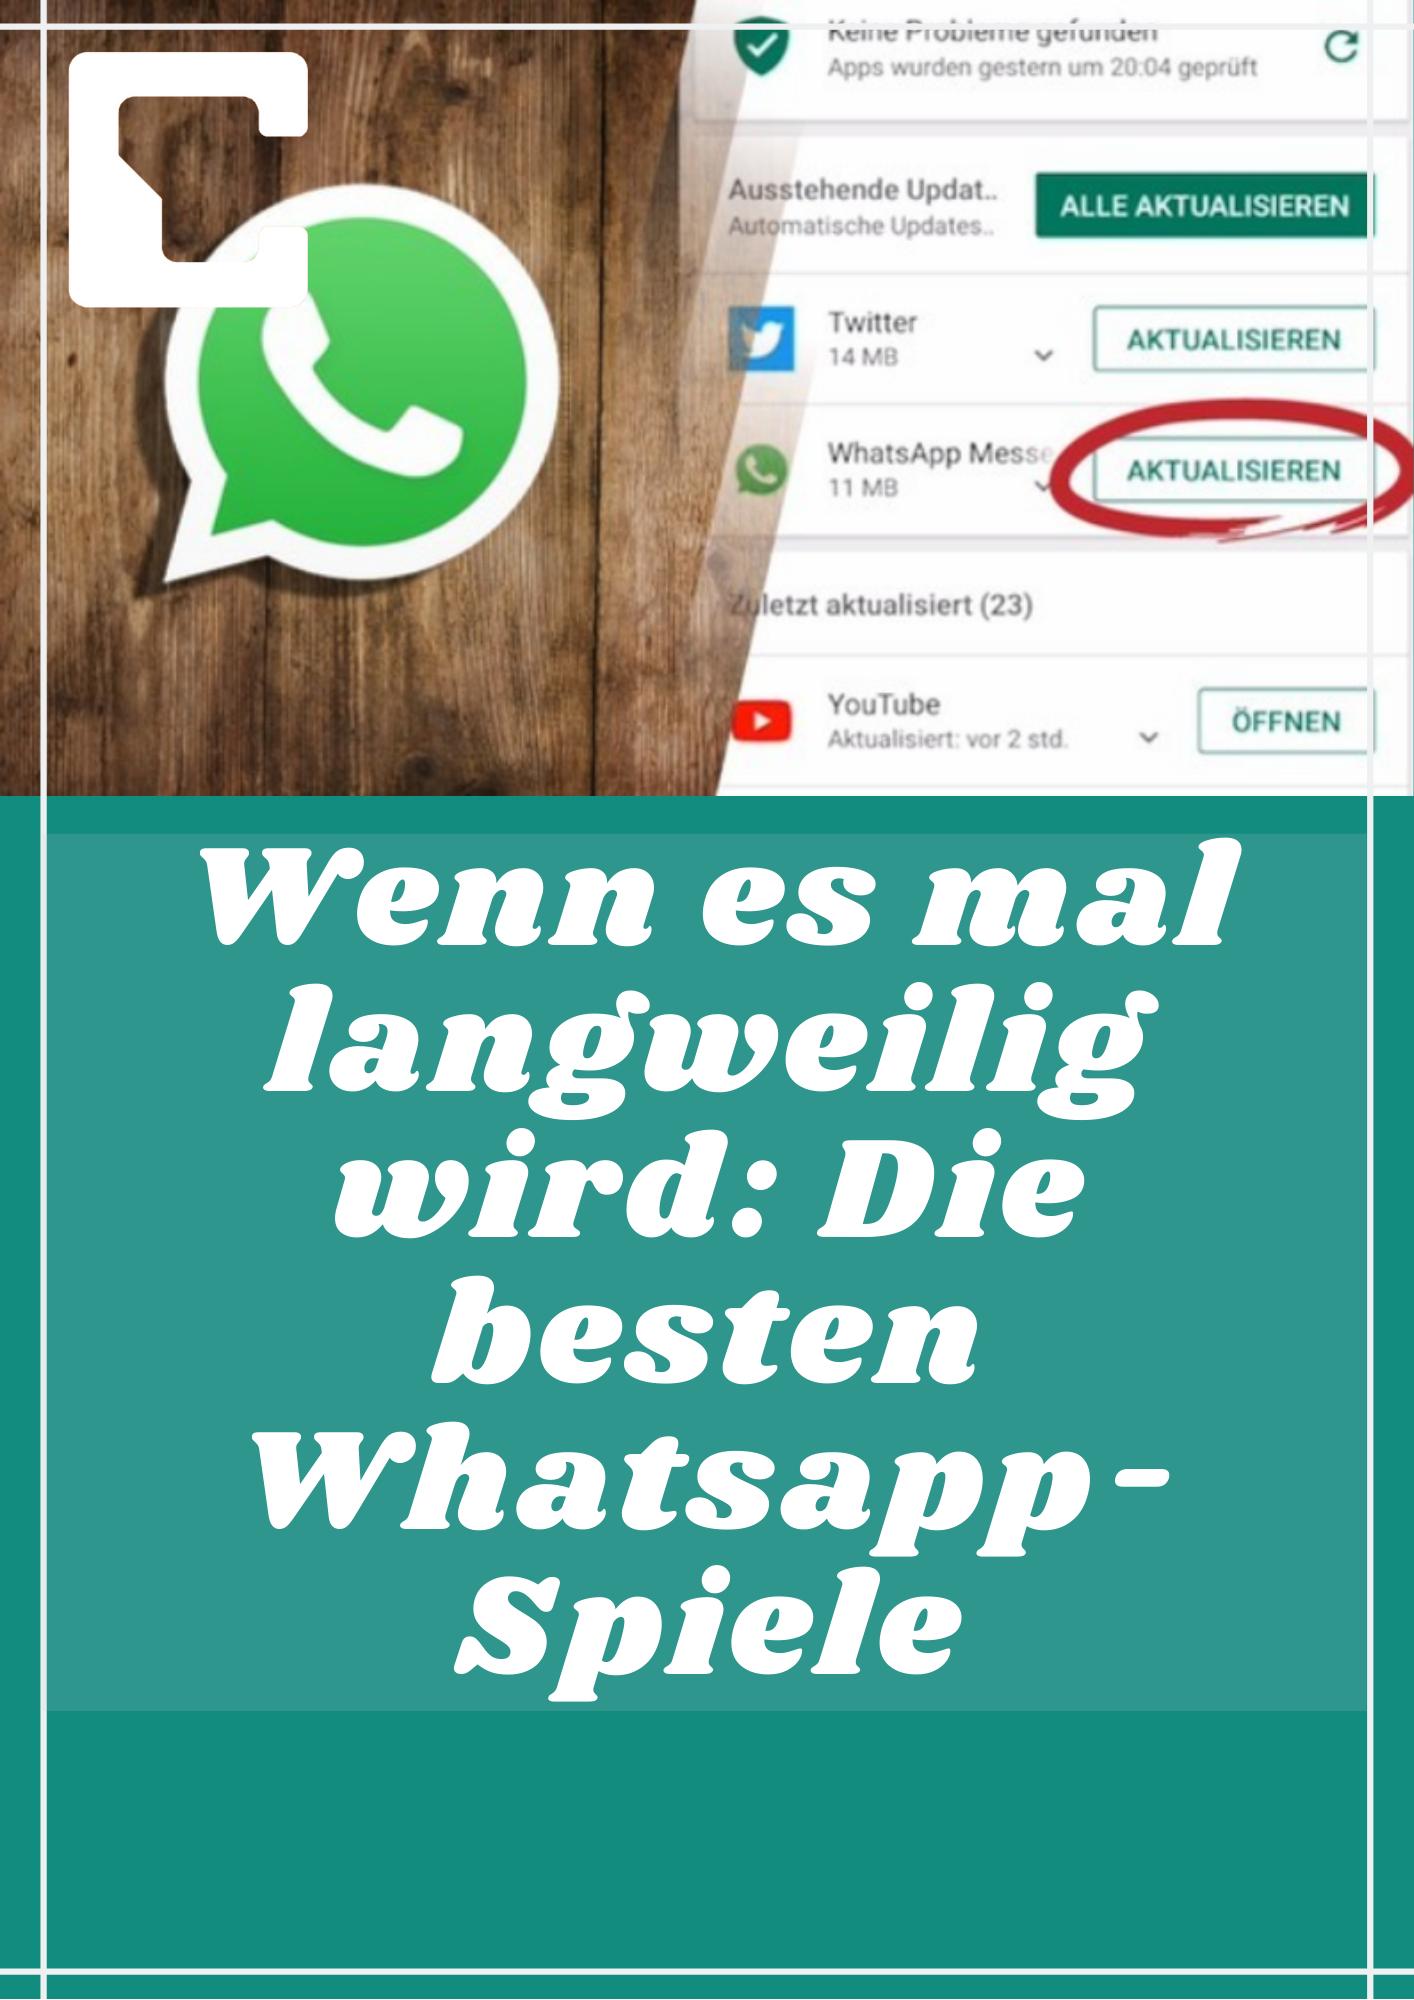 Die besten Whatsapp-Spiele in 2020   Whatsapp spiele